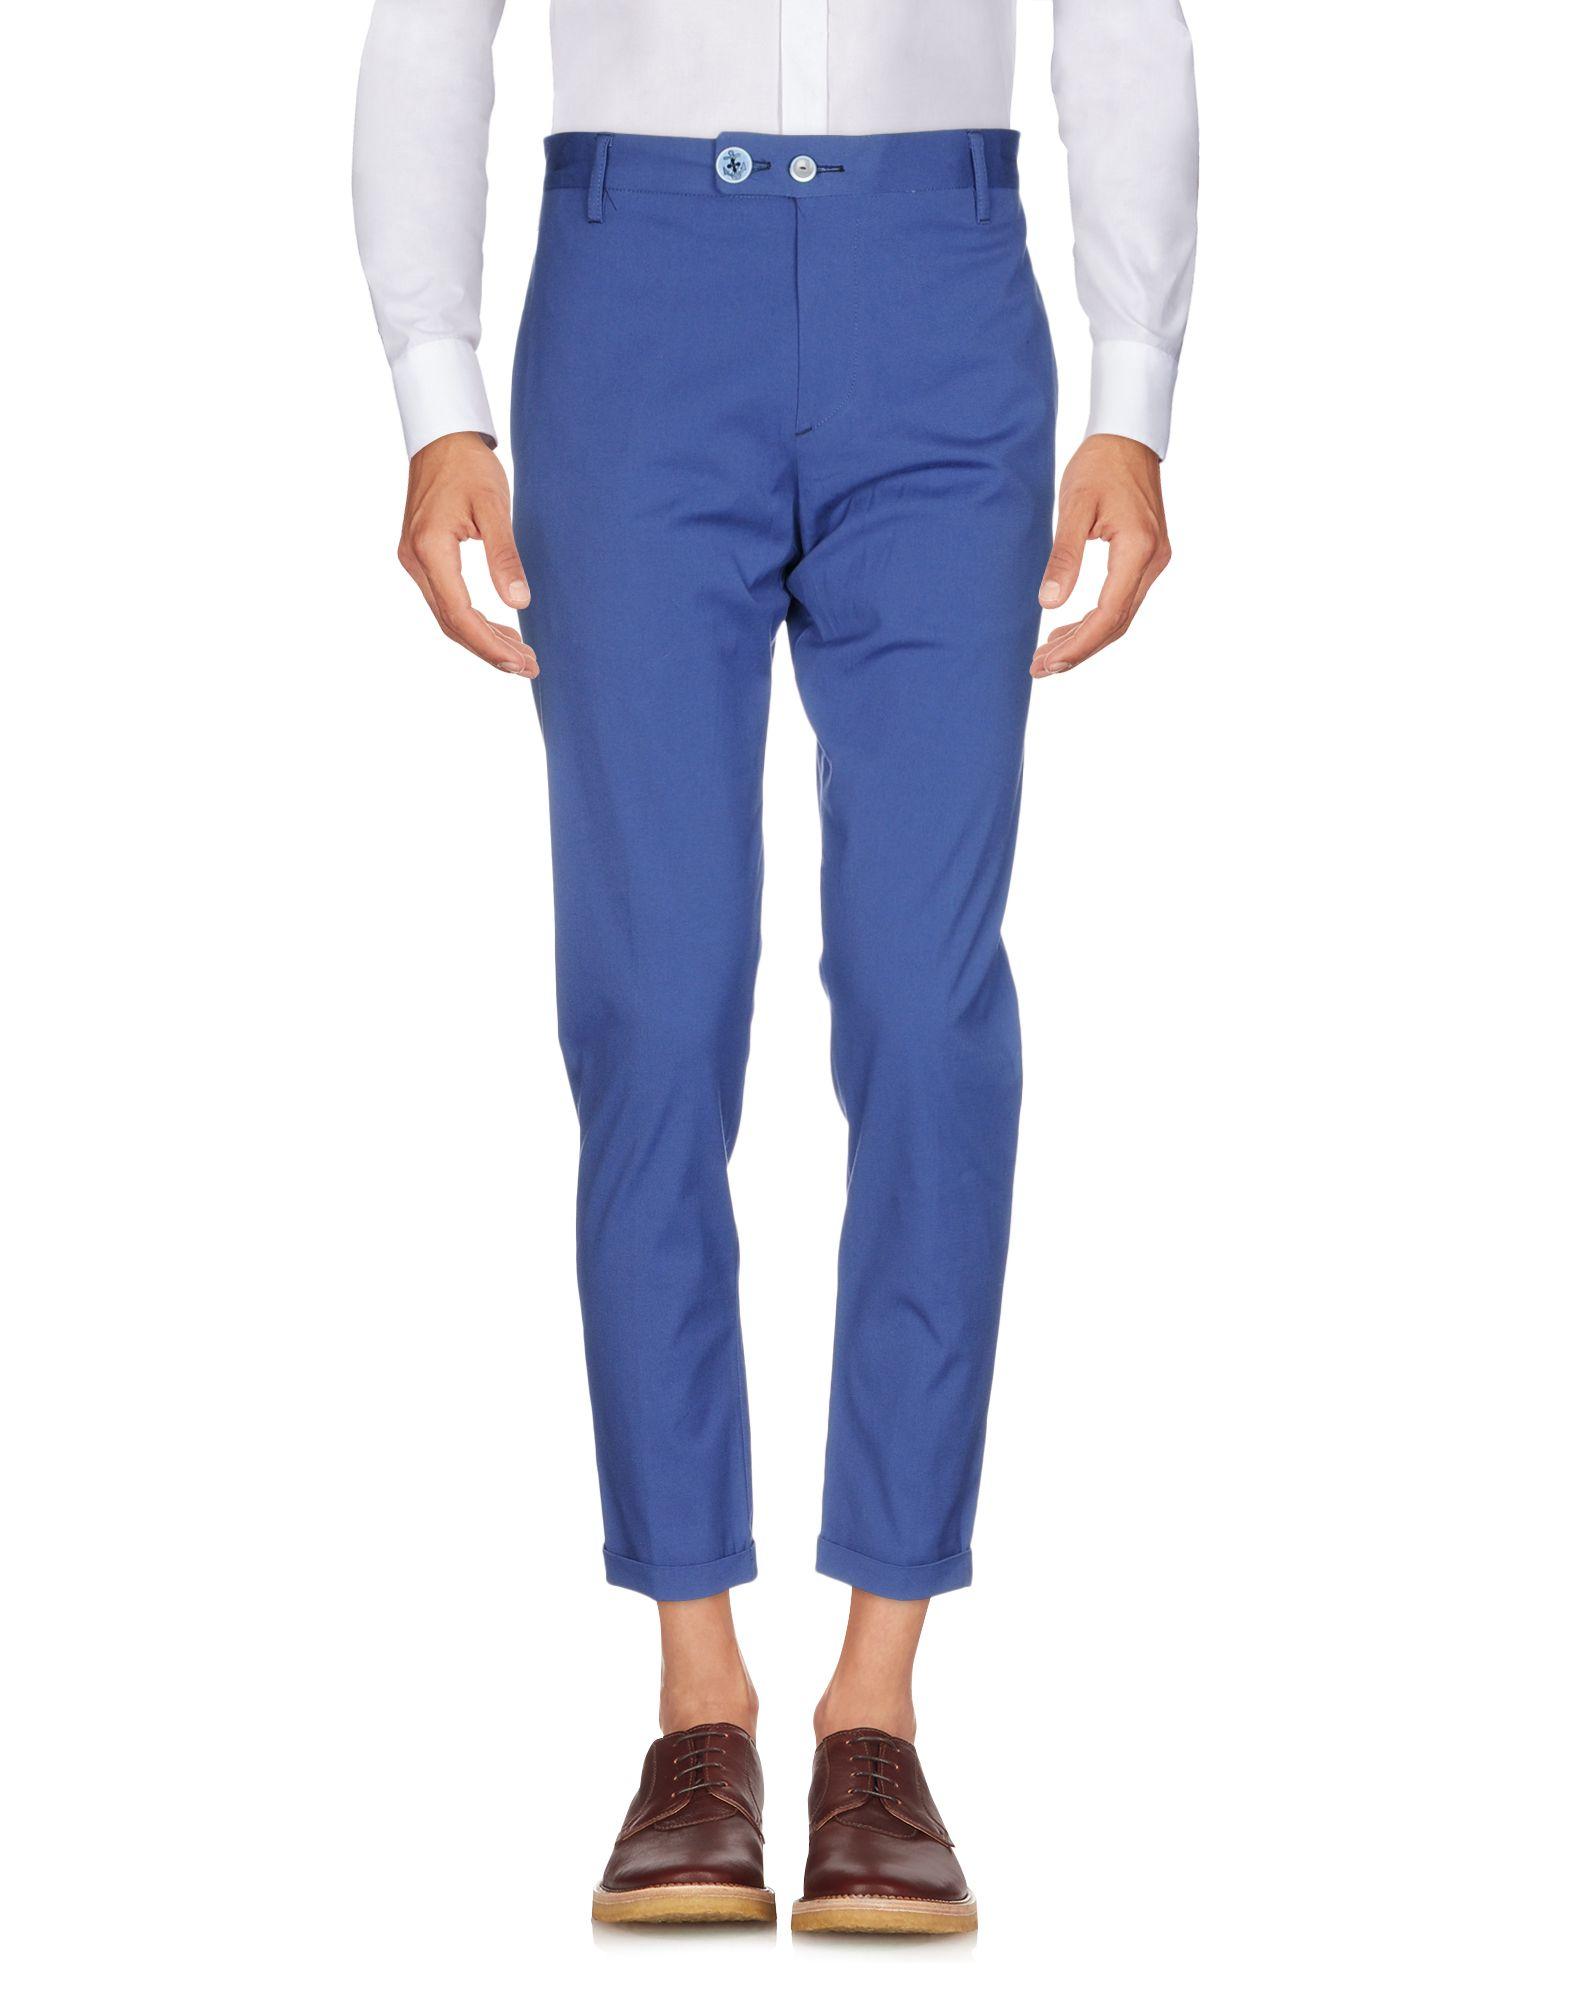 NEILL KATTER Повседневные брюки брюки o neill брюки